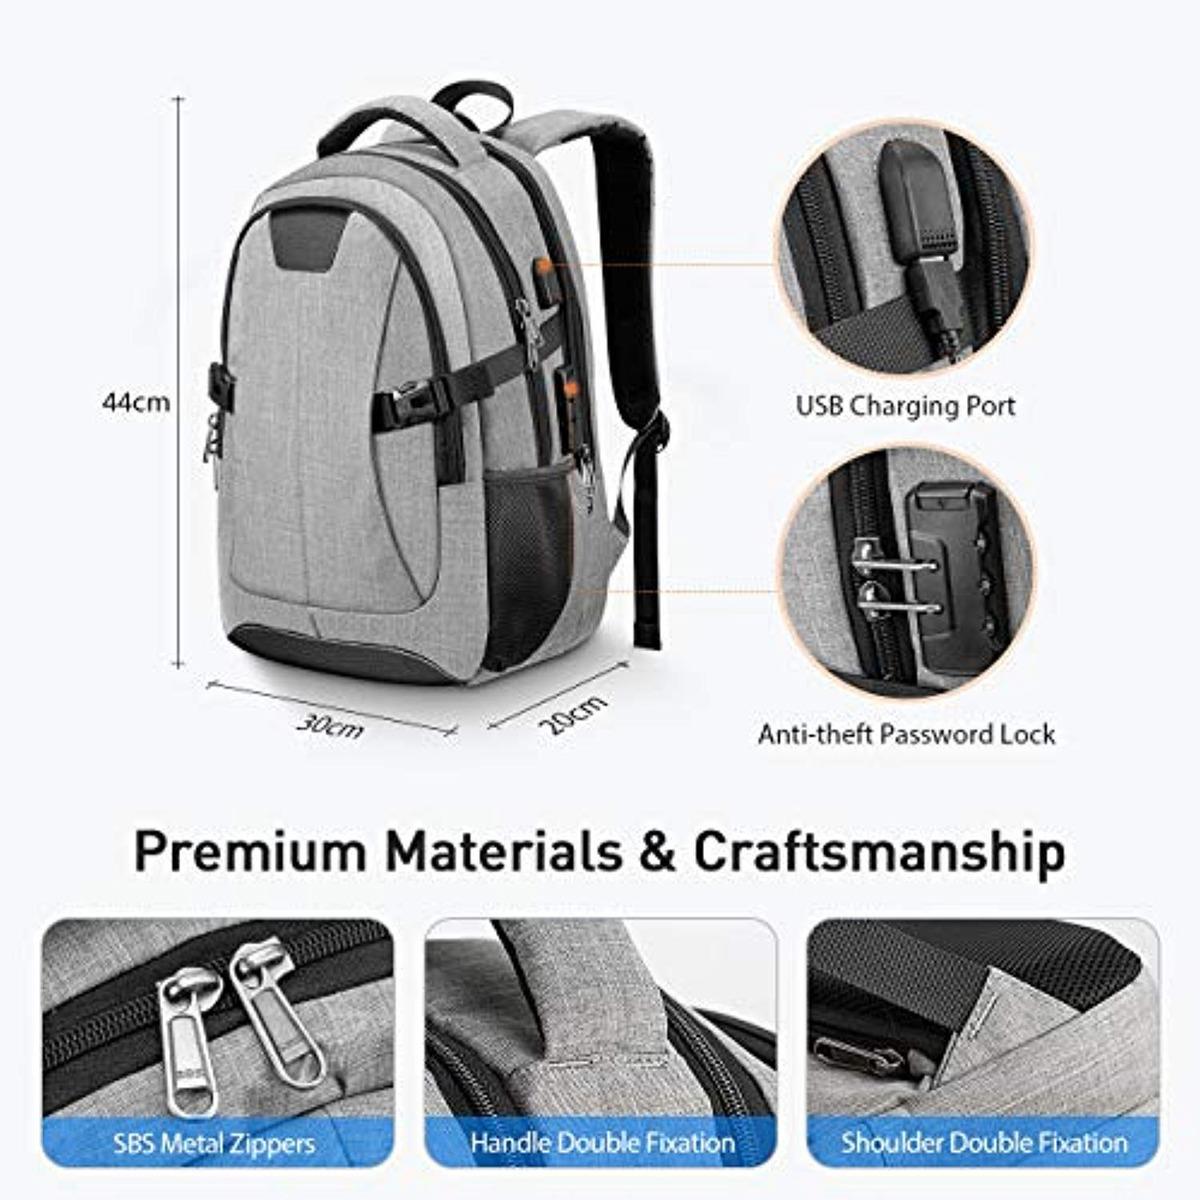 02799d96c54f Morral Travel Laptop Backpack, Pictek Anti-theft